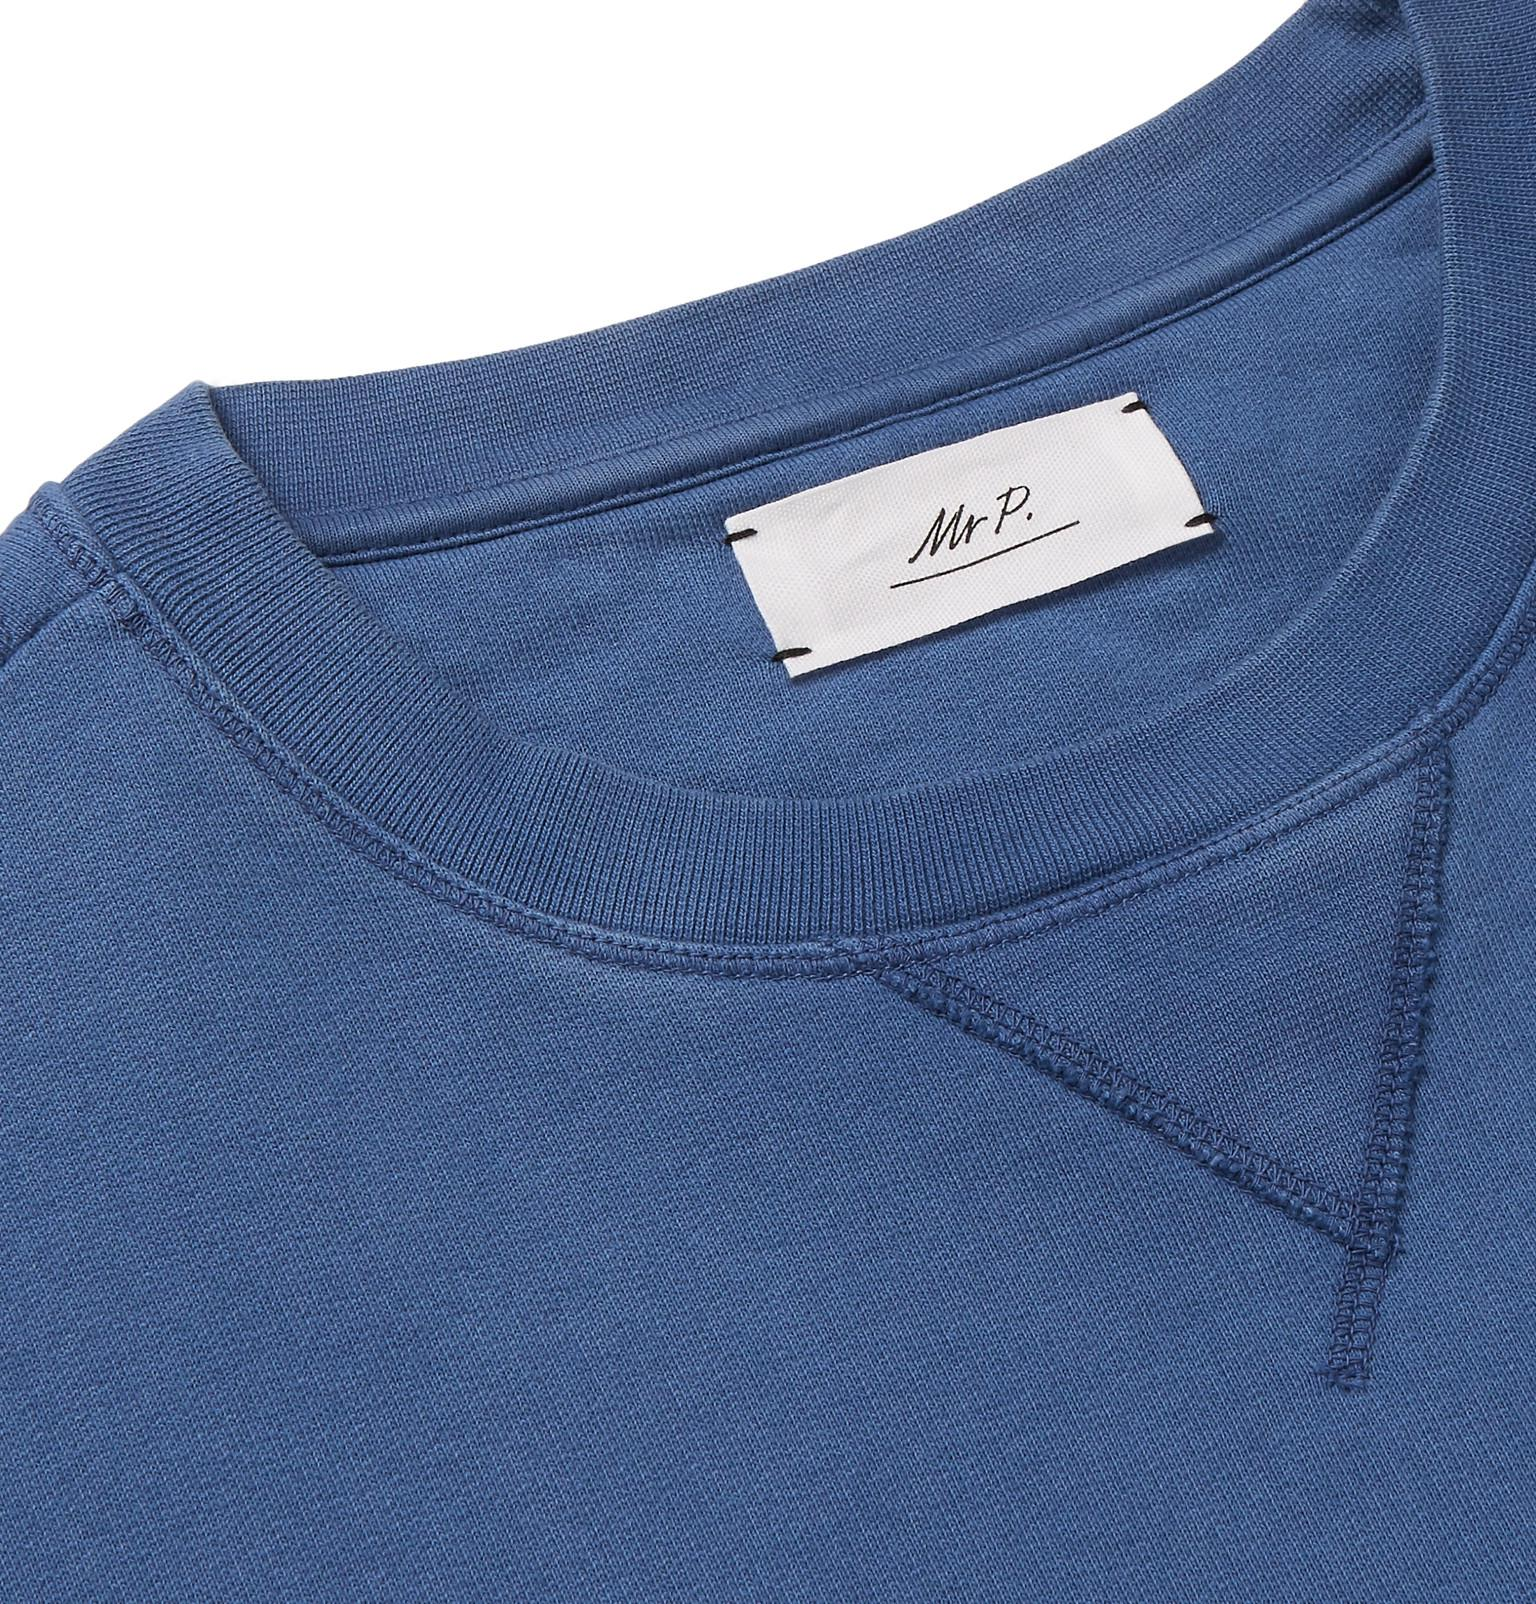 dd904c5681ffb mr-p-blue-Garment-dyed-Loopback-Cotton-jersey-Sweatshirt.jpeg